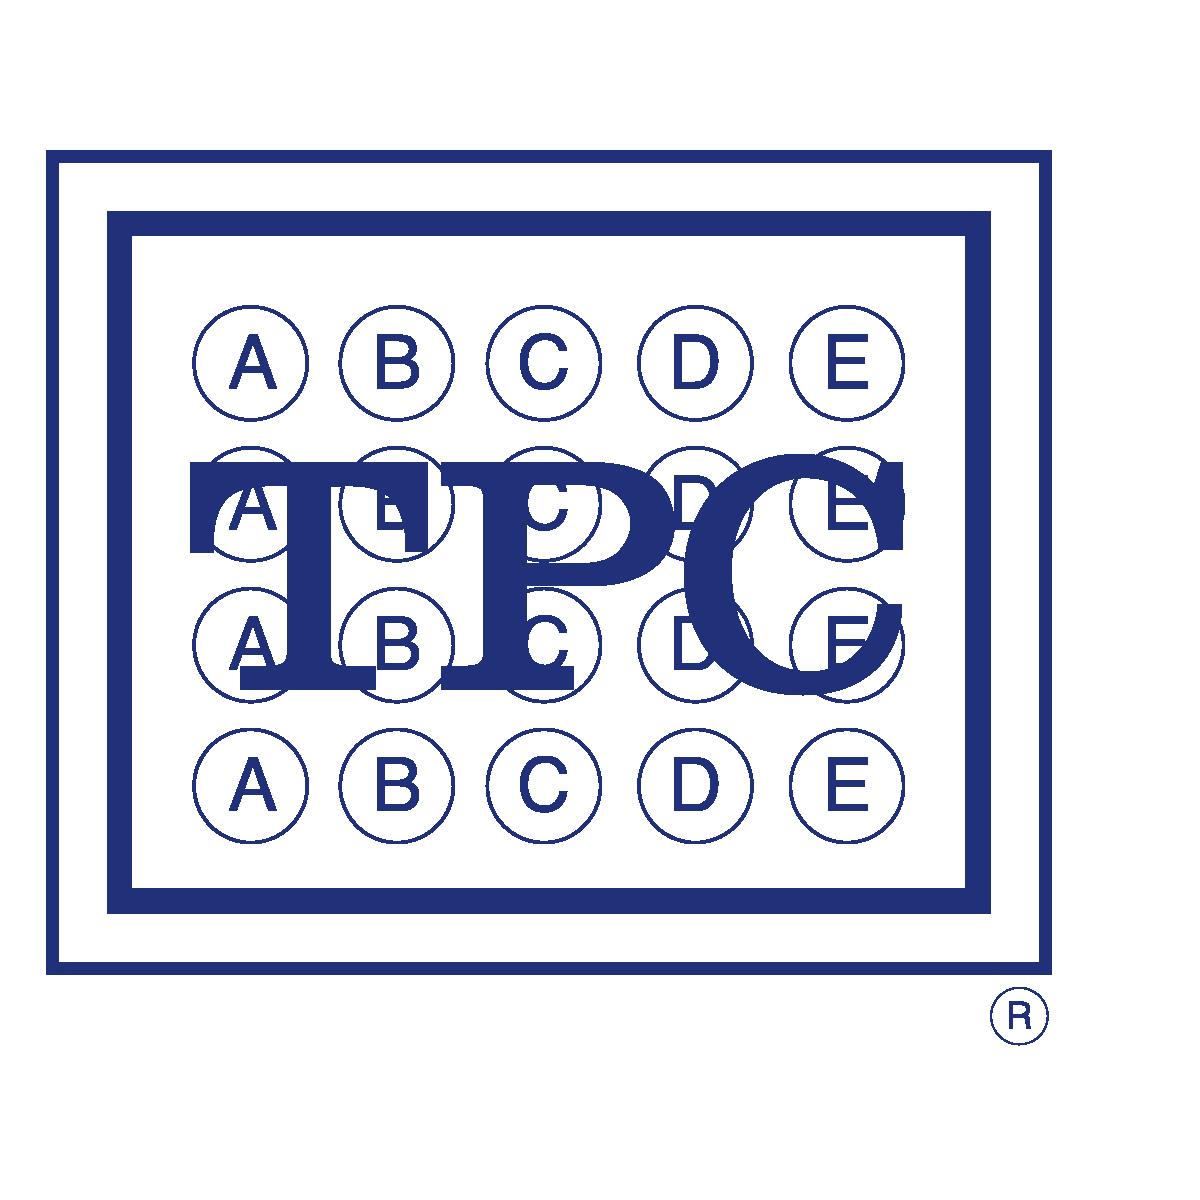 hight resolution of High School Entrance Exam Testing - Test Prep Chicago